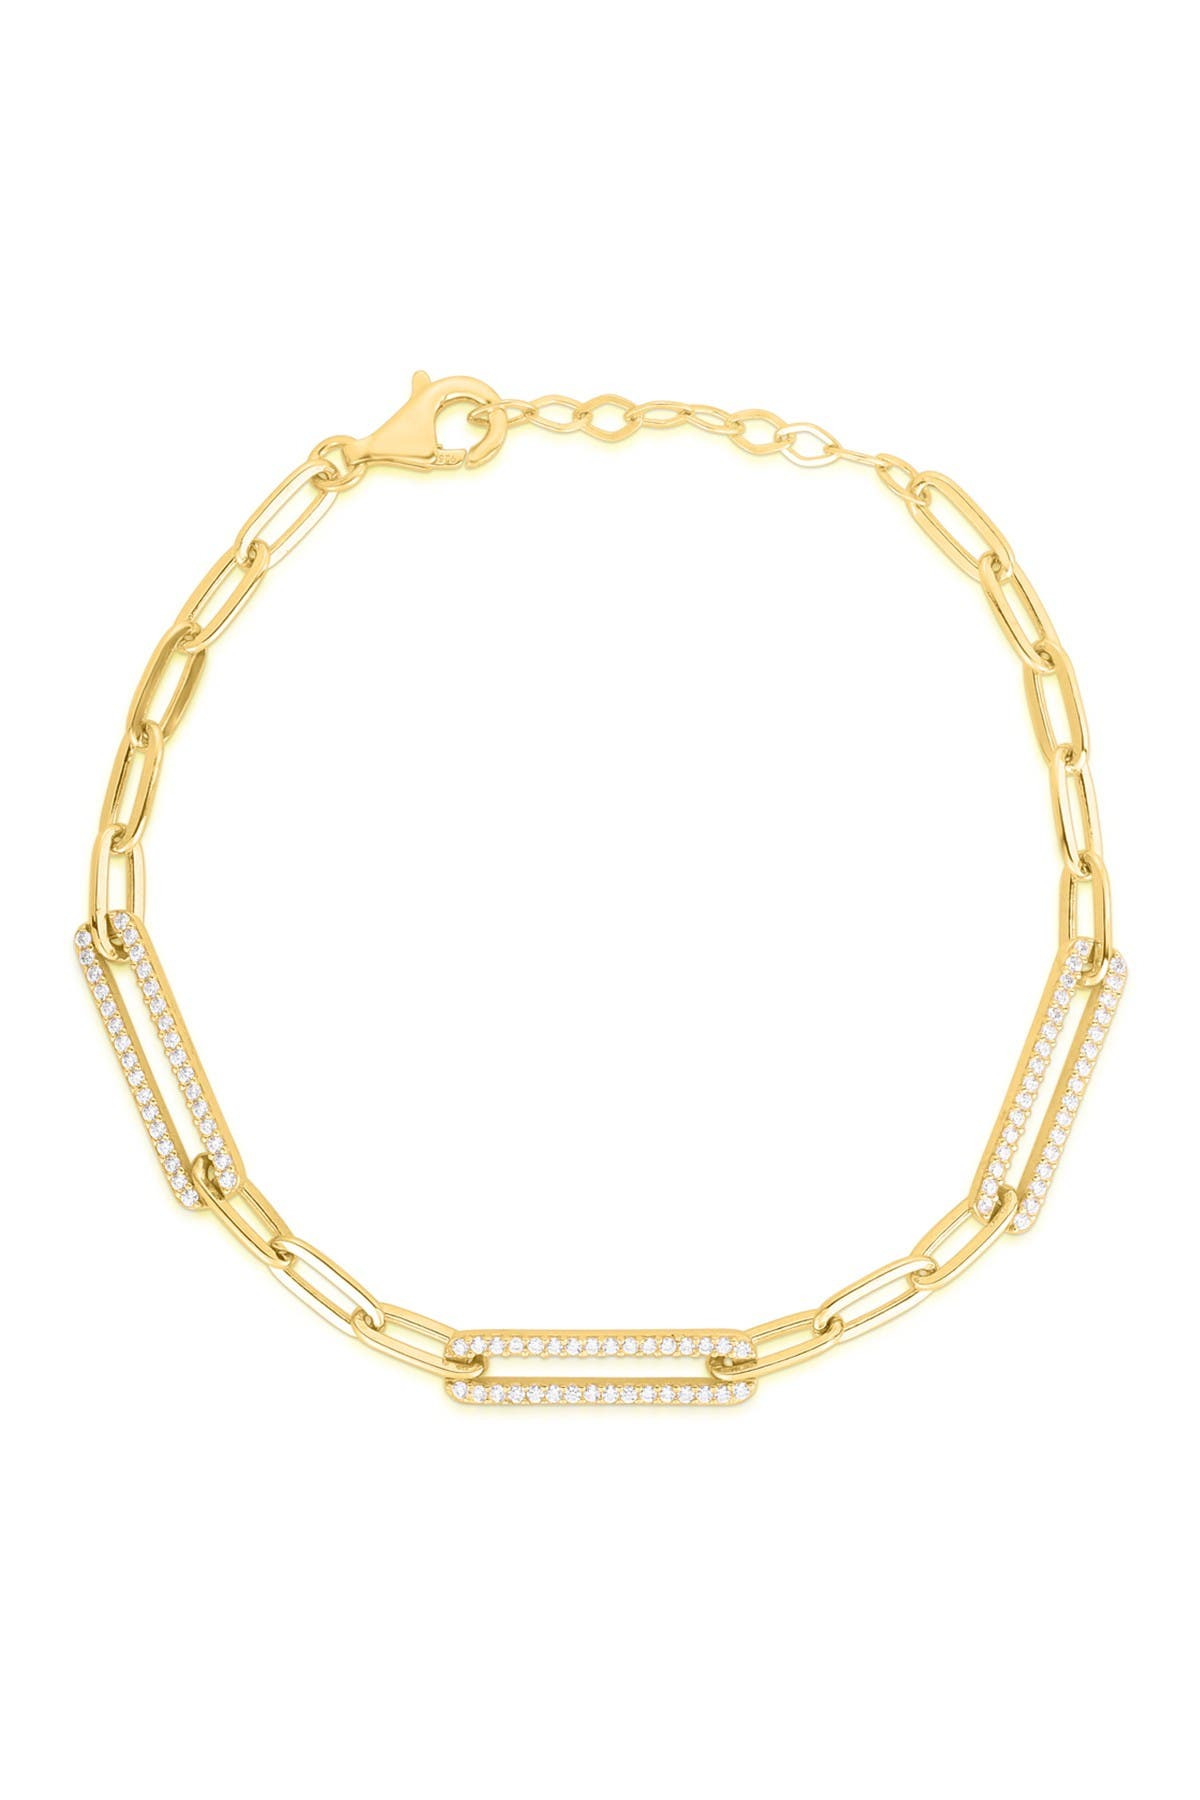 Image of Sphera Milano 14K Gold Vermeil CZ Link Chain Bracelet